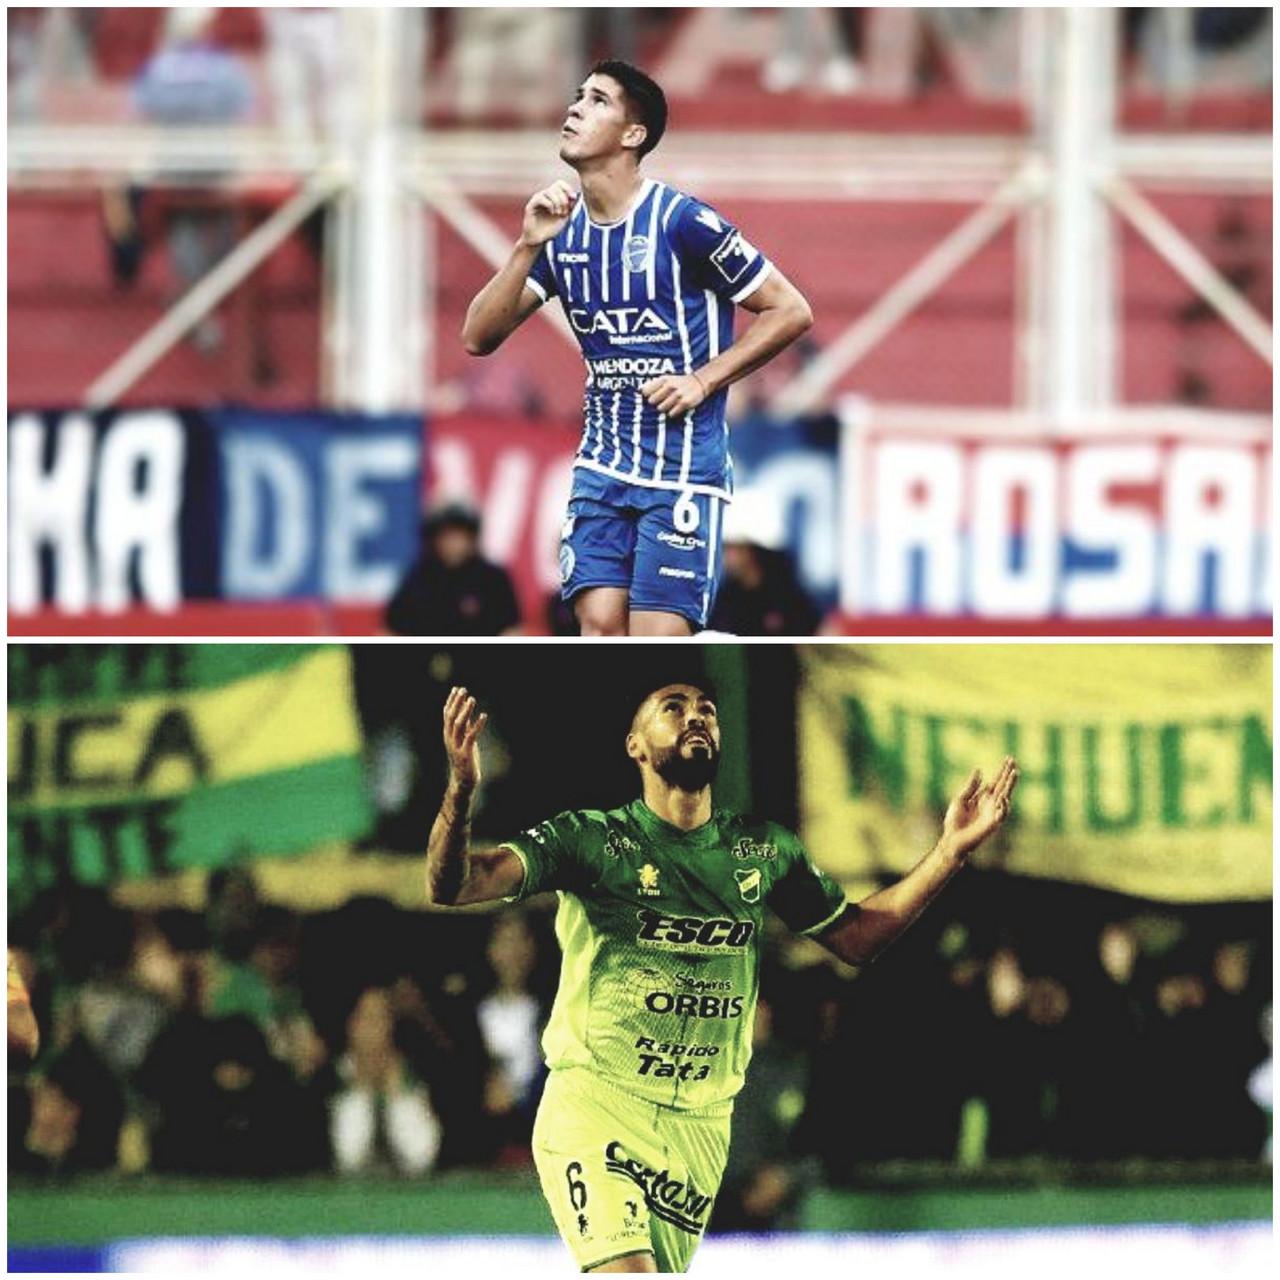 Cara a cara: Tomás Cardona vs Alexander Barboza